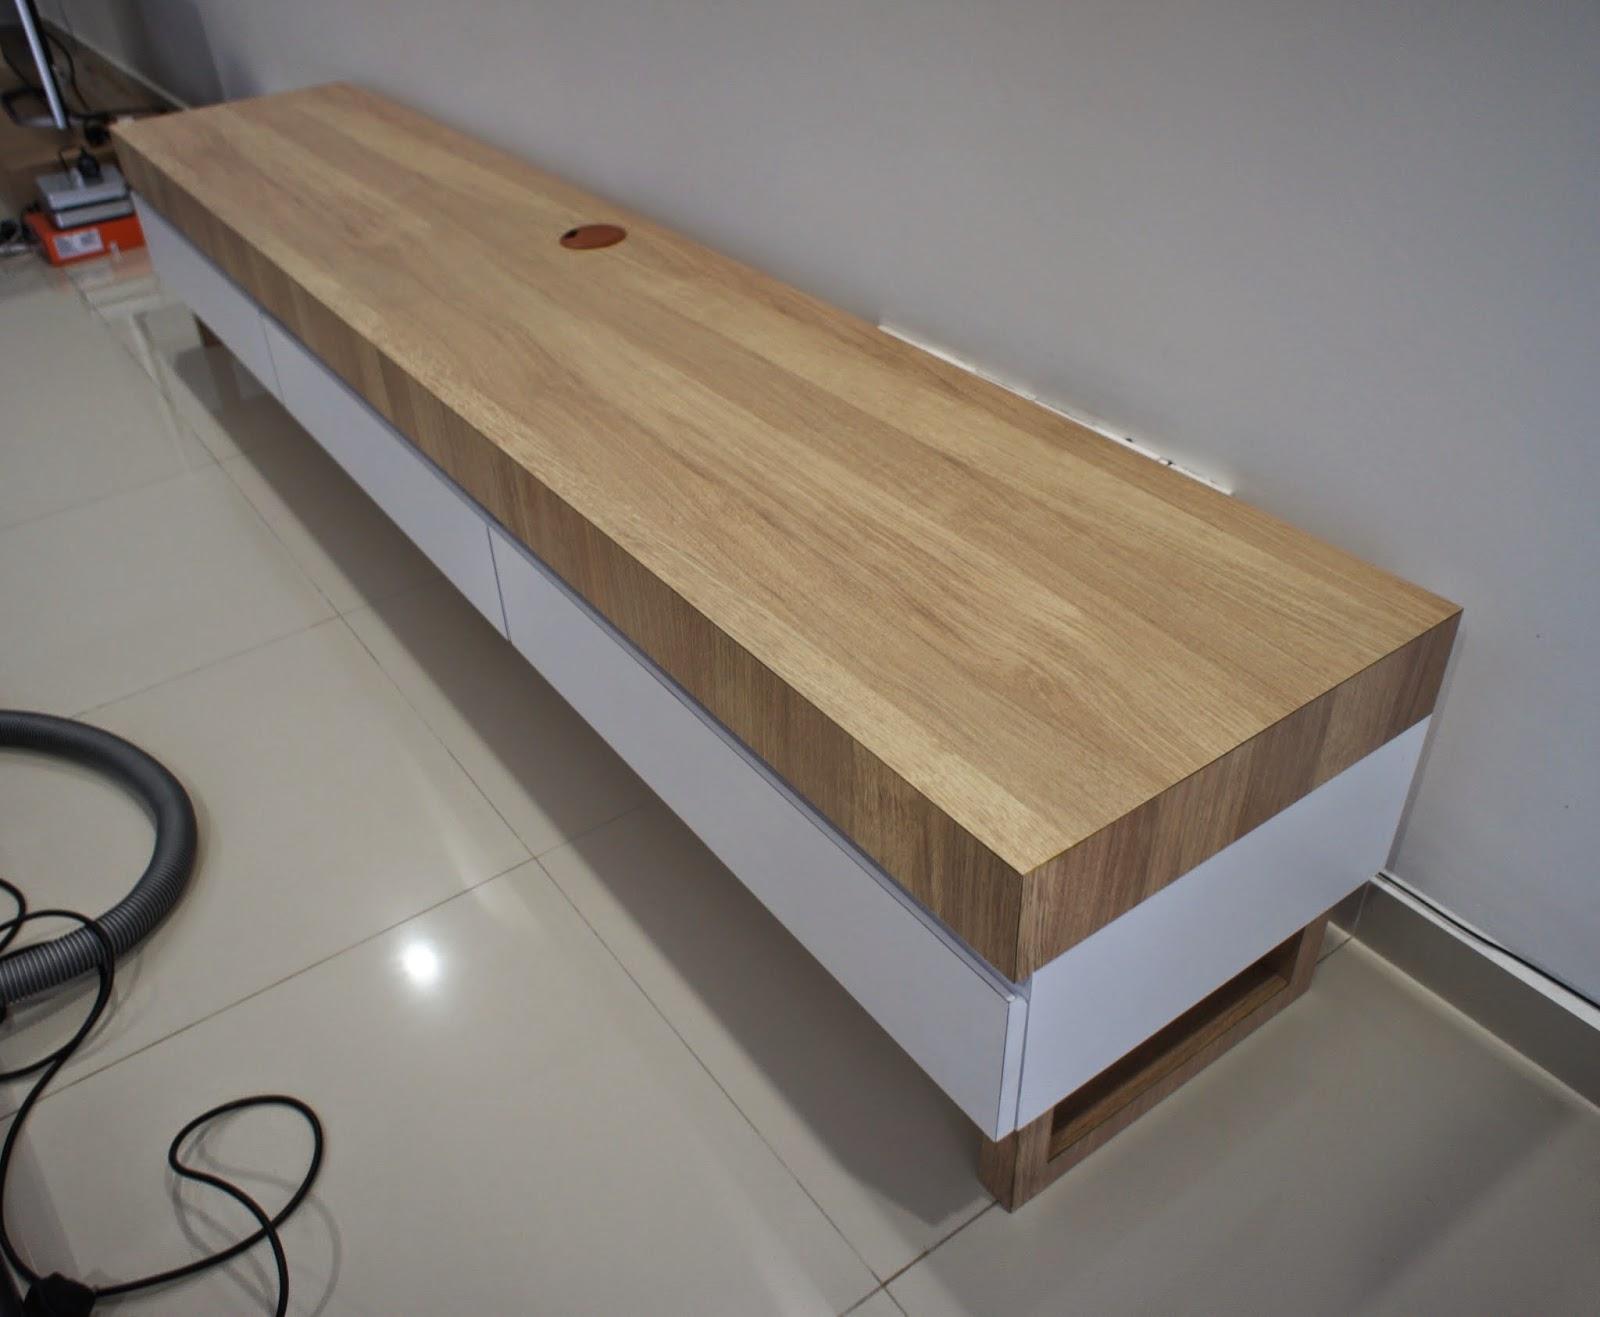 Dining Room Sets Jordans Fukusu Scandinavian Design Tv Cabinet And Study Table In